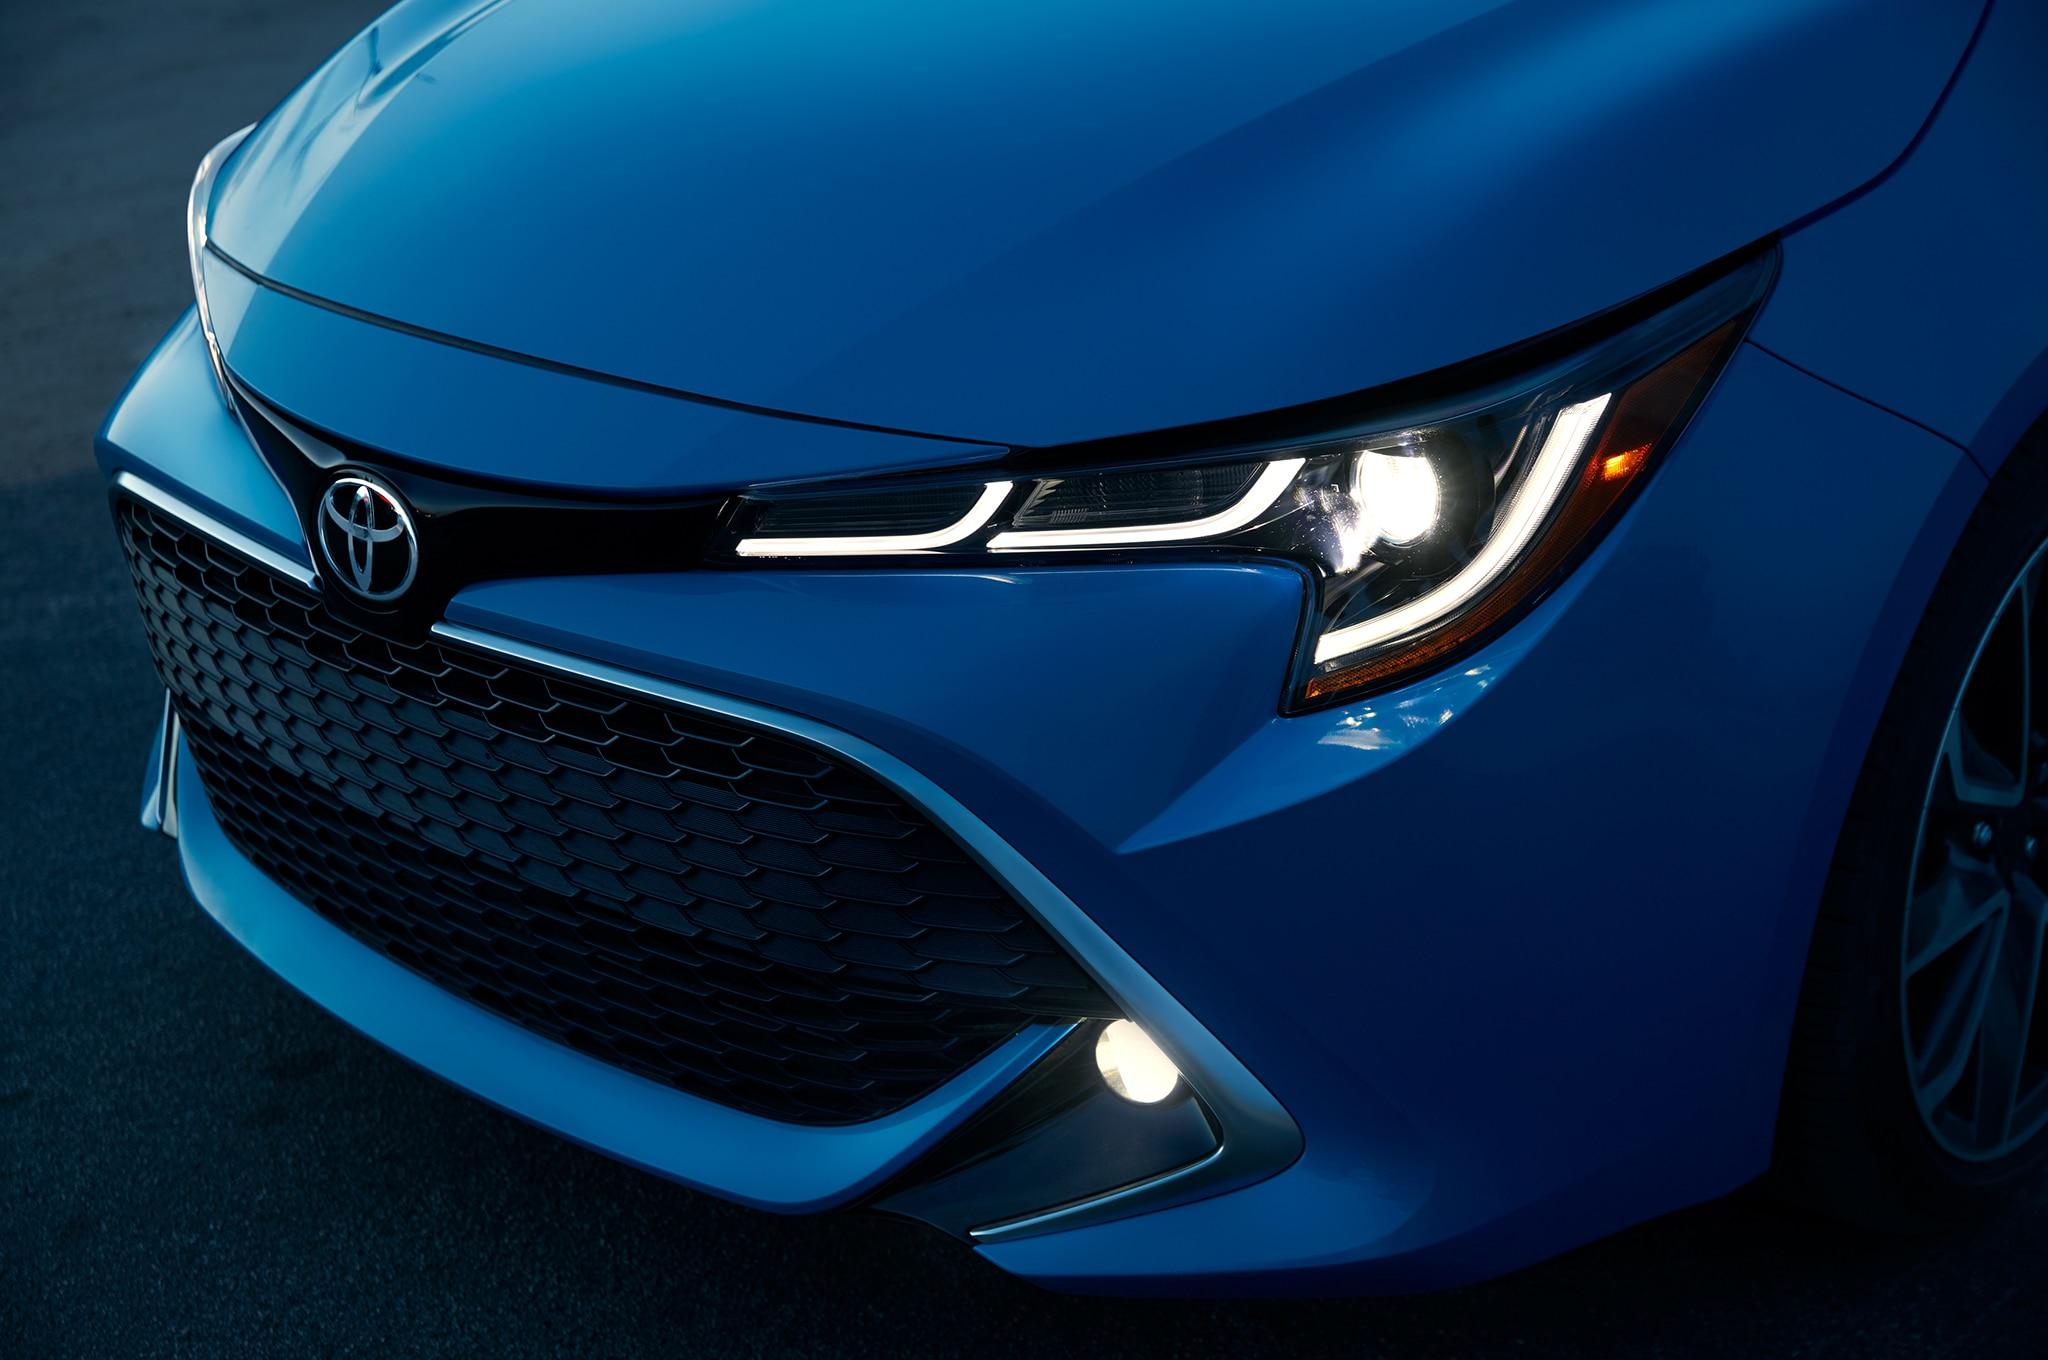 2019 Toyota Corolla Hatchback Hatches Outside of Javits ...